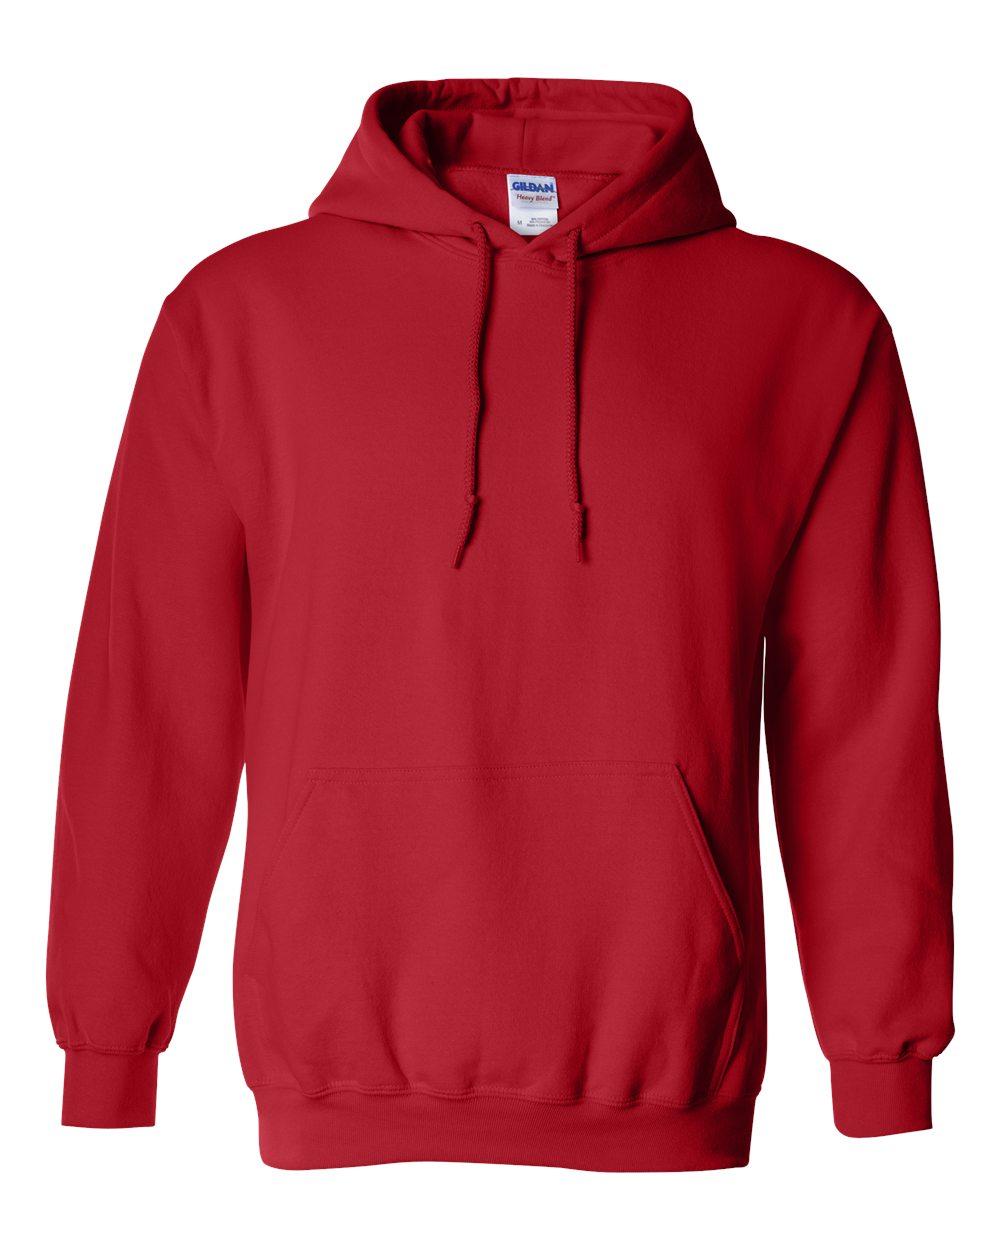 Gildan-Mens-Blank-Hoodie-Heavy-Blend-Hooded-Sweatshirt-Solid-18500-up-to-5XL thumbnail 74